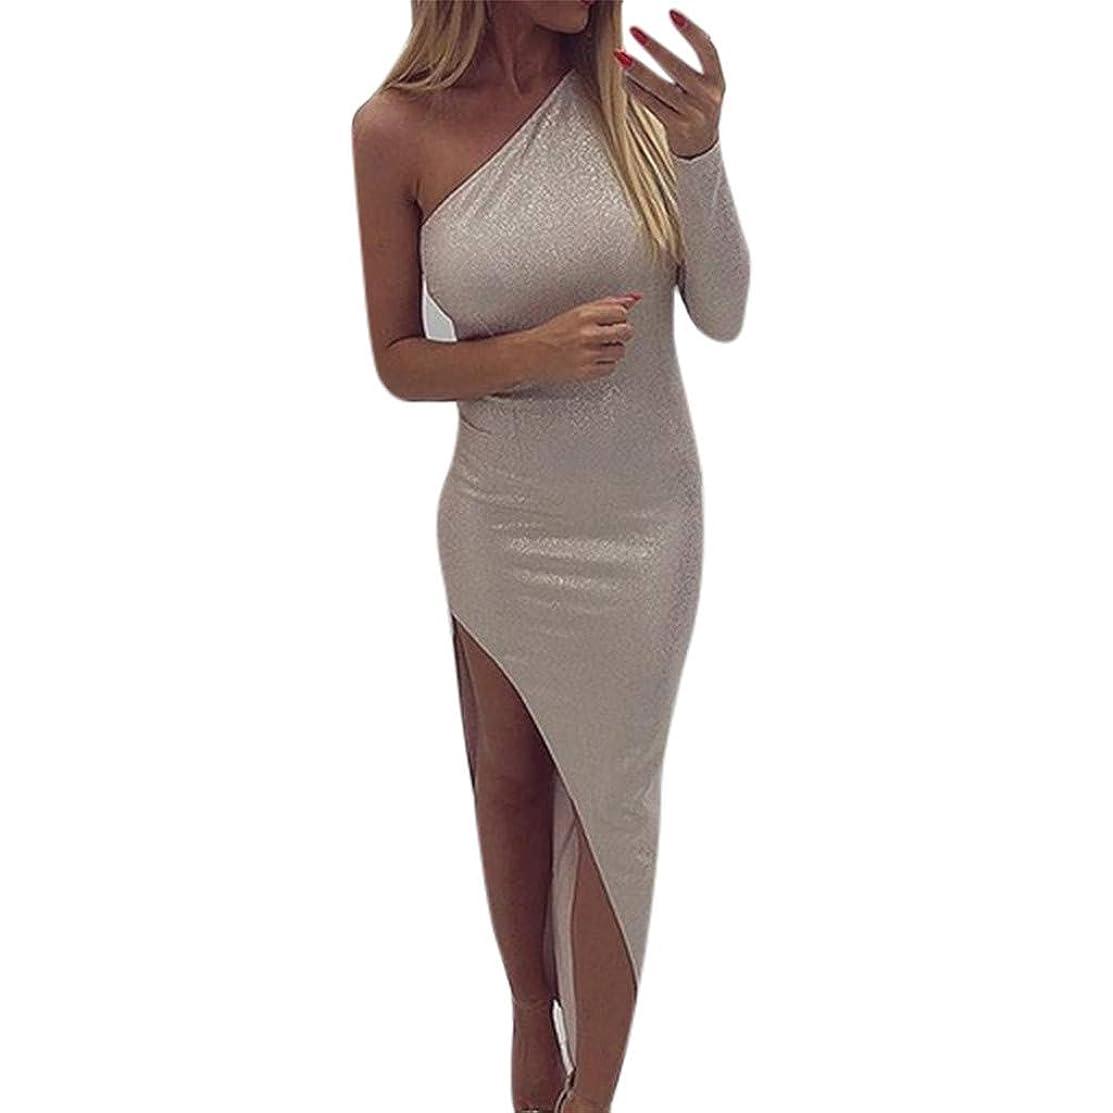 Women's Dresses Sexy Ruffle One Shoulder Sleeveless Split Bodycon Midi Party Dress